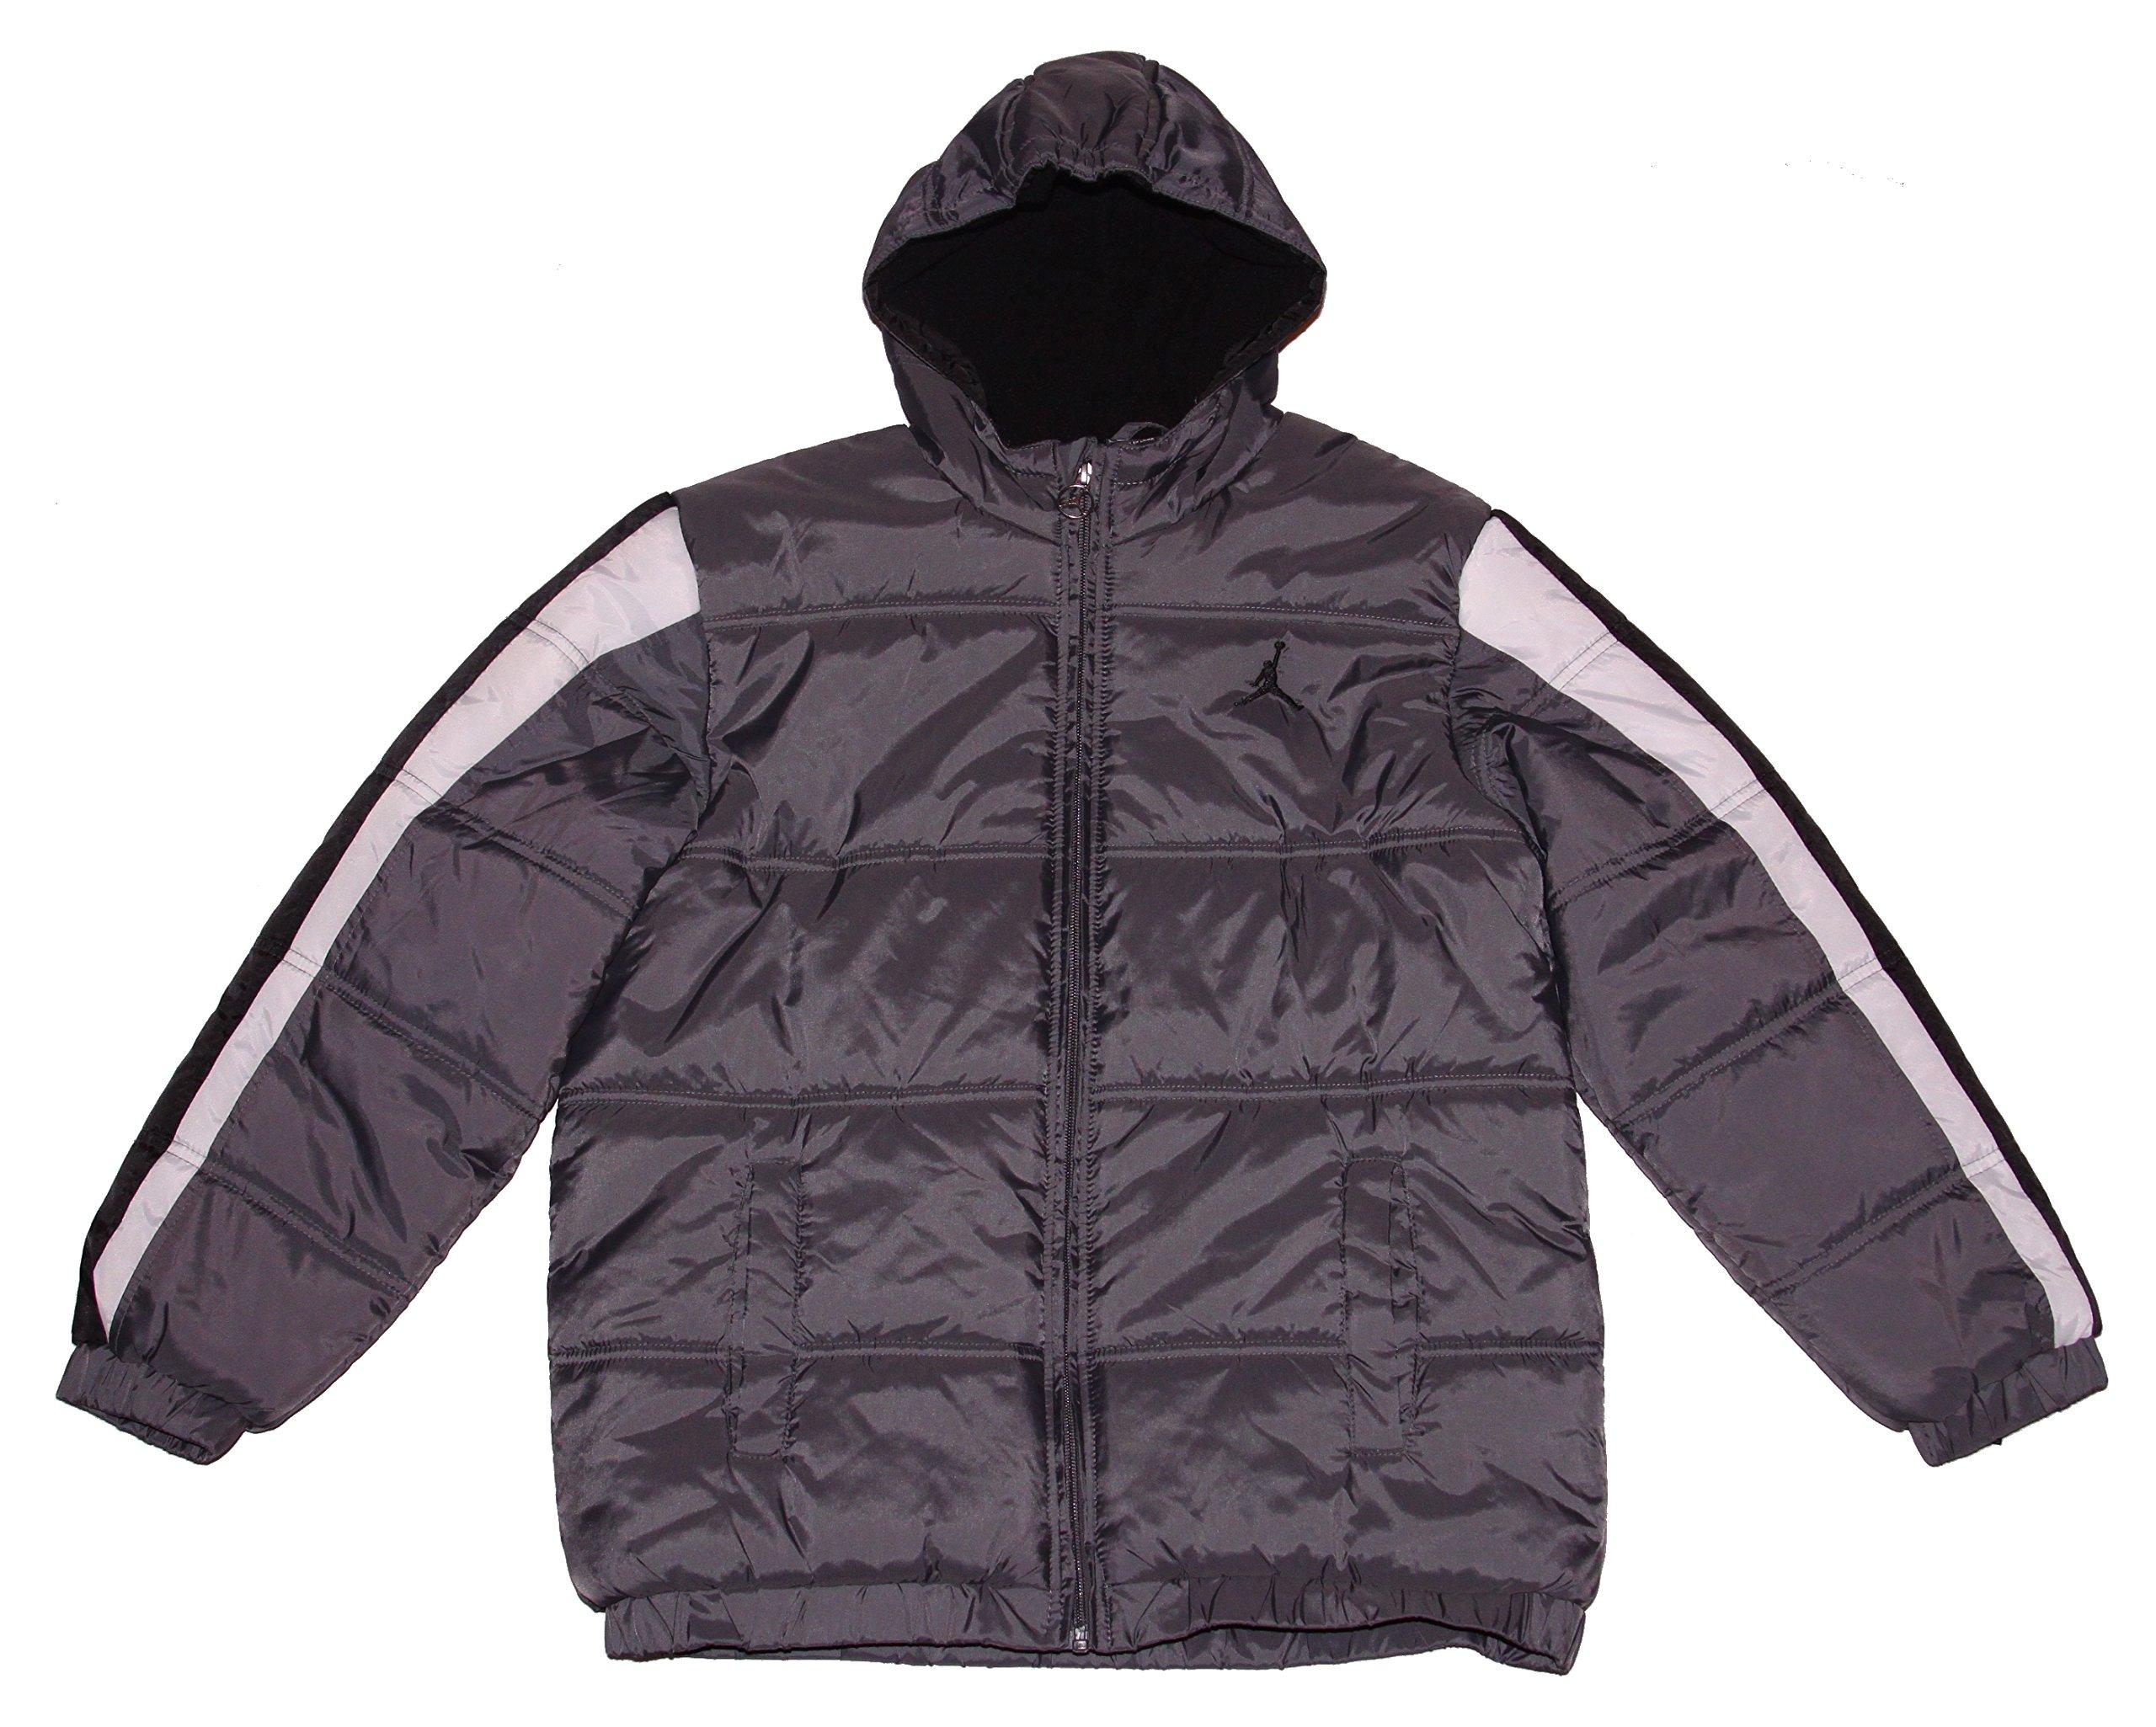 Nike Boy's Jordan Jumpman Hooded Puffy Jacket Large - Grey/Black/White by NIKE